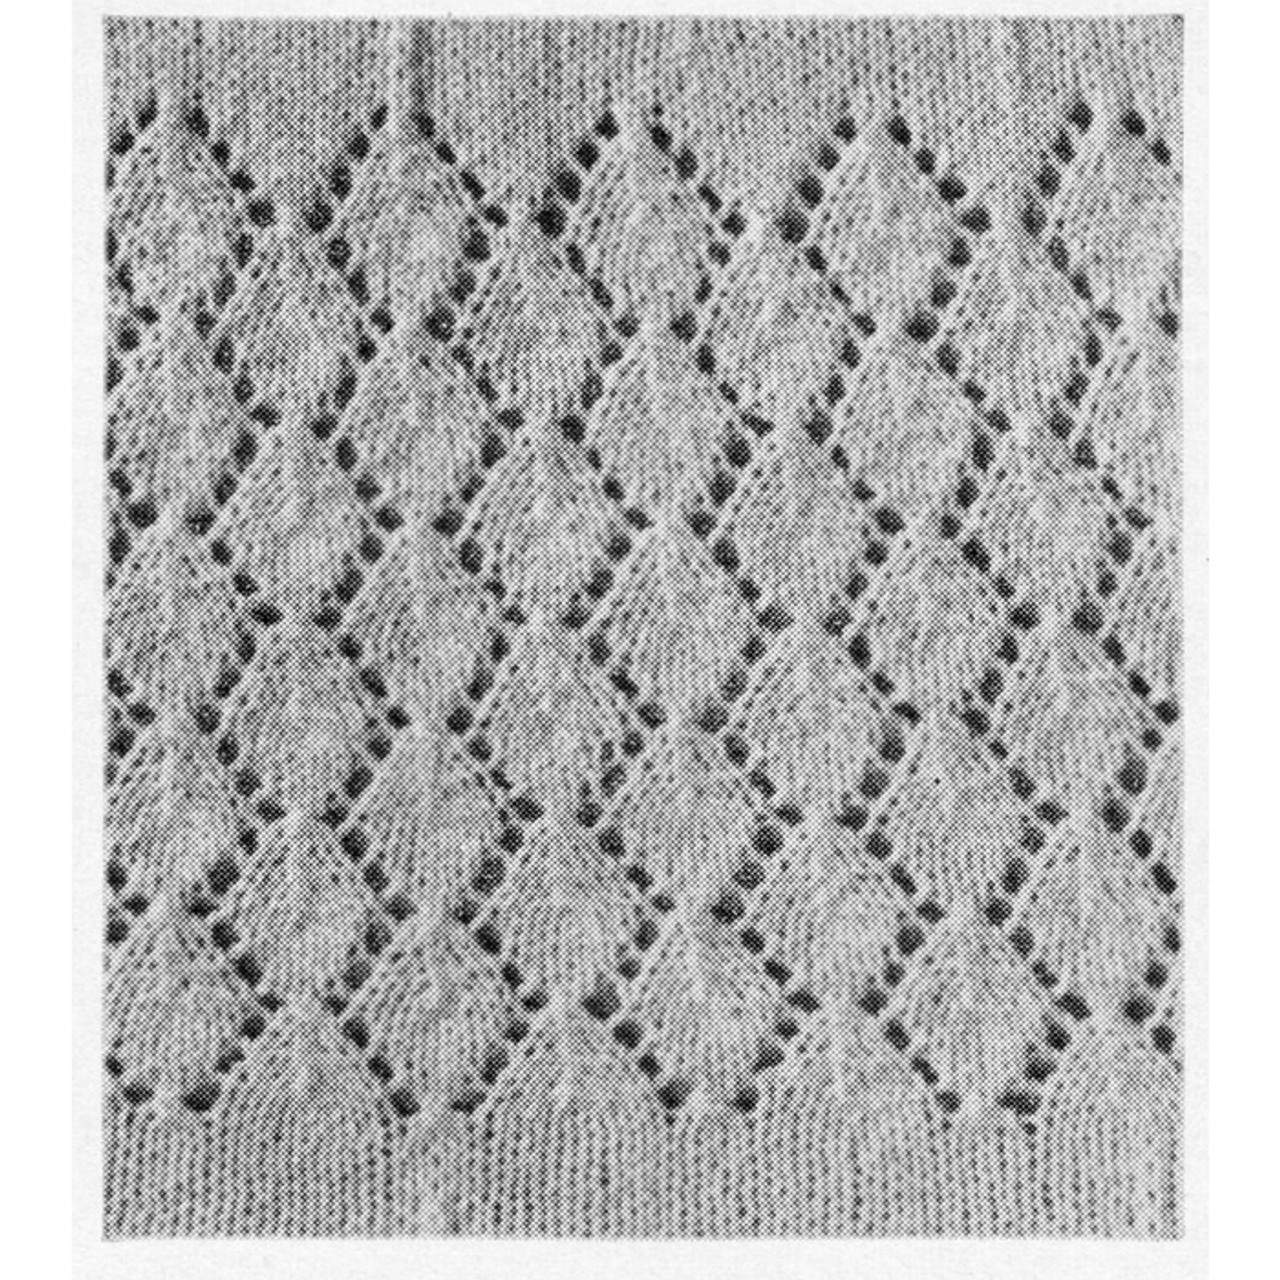 Lace Dress Pattern Stitch Illustration